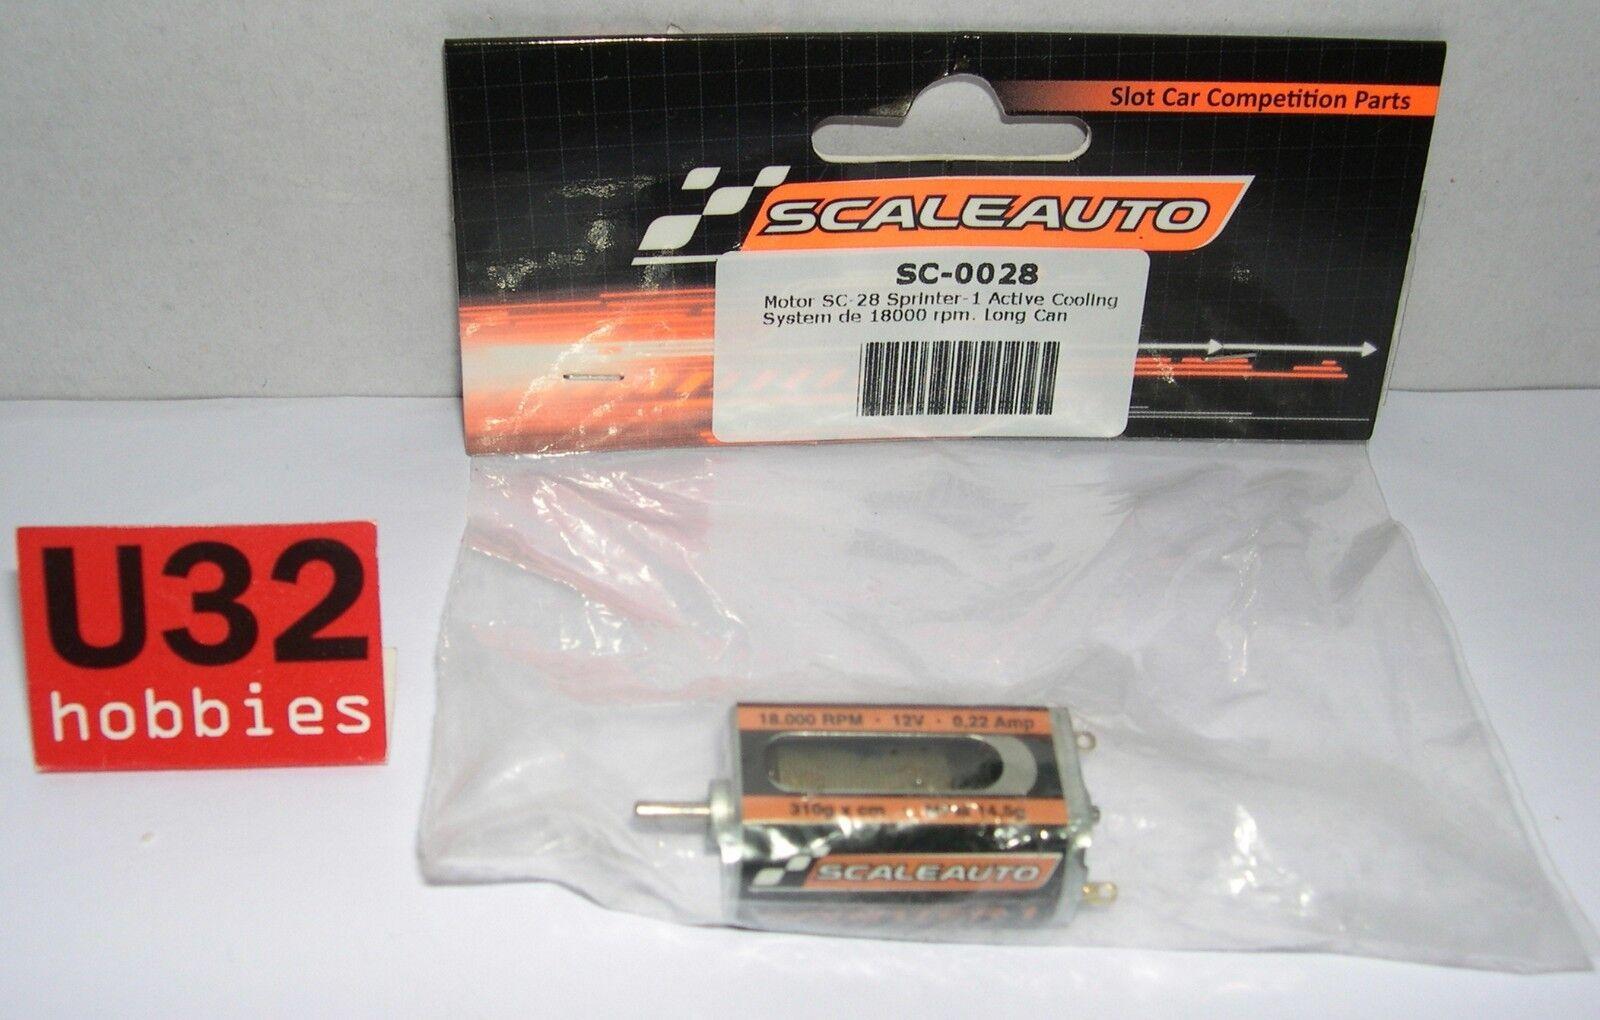 SCALEAUTO SC-0028 MOTOR SC-25 SPRINTER-1 18000rpm 12v 0.22 Amp 310gr MPM14.5gr